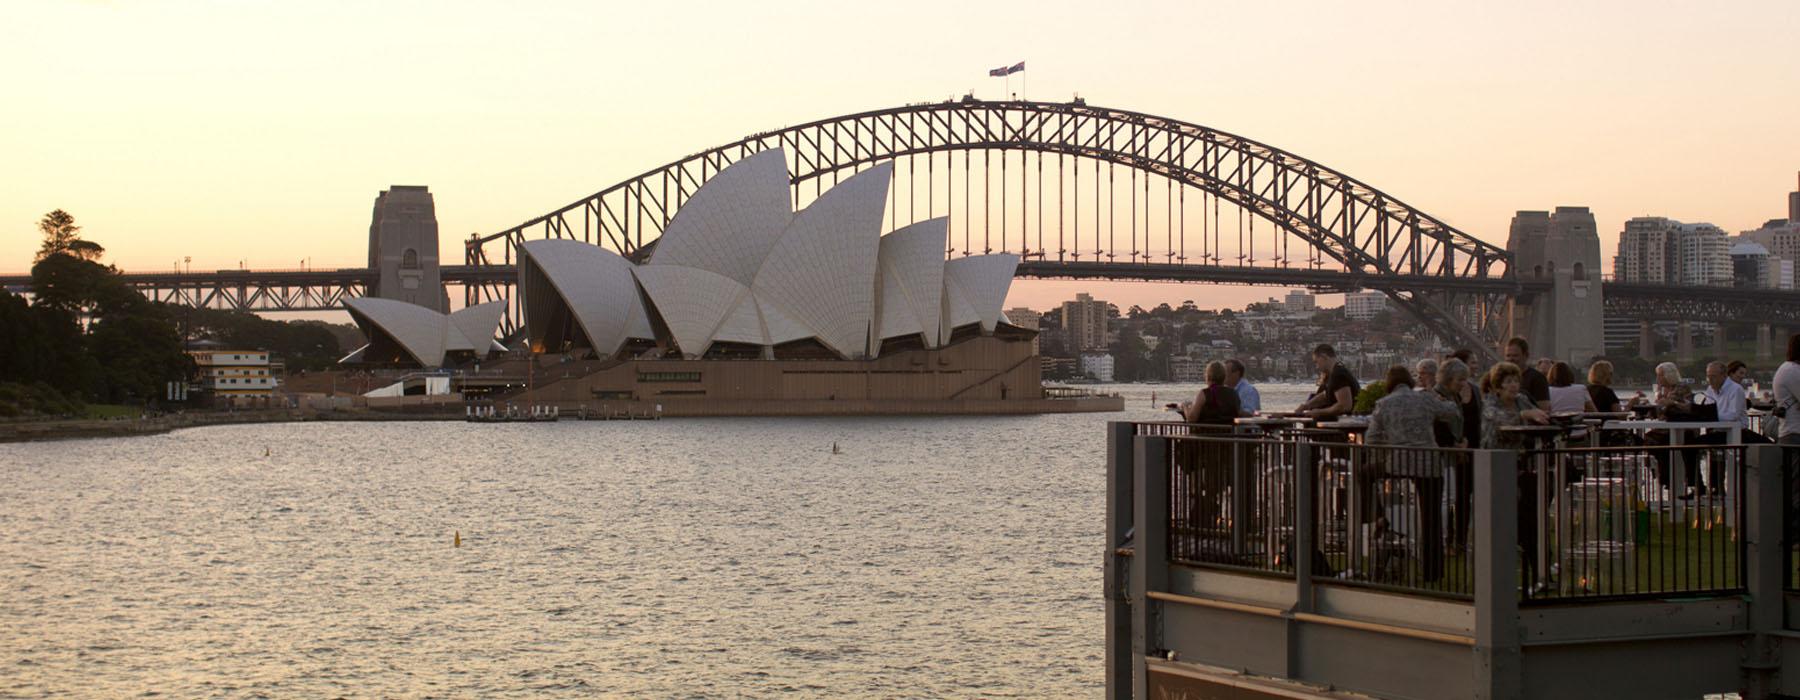 asiatique rencontres Geelong application de rencontres de correspondance